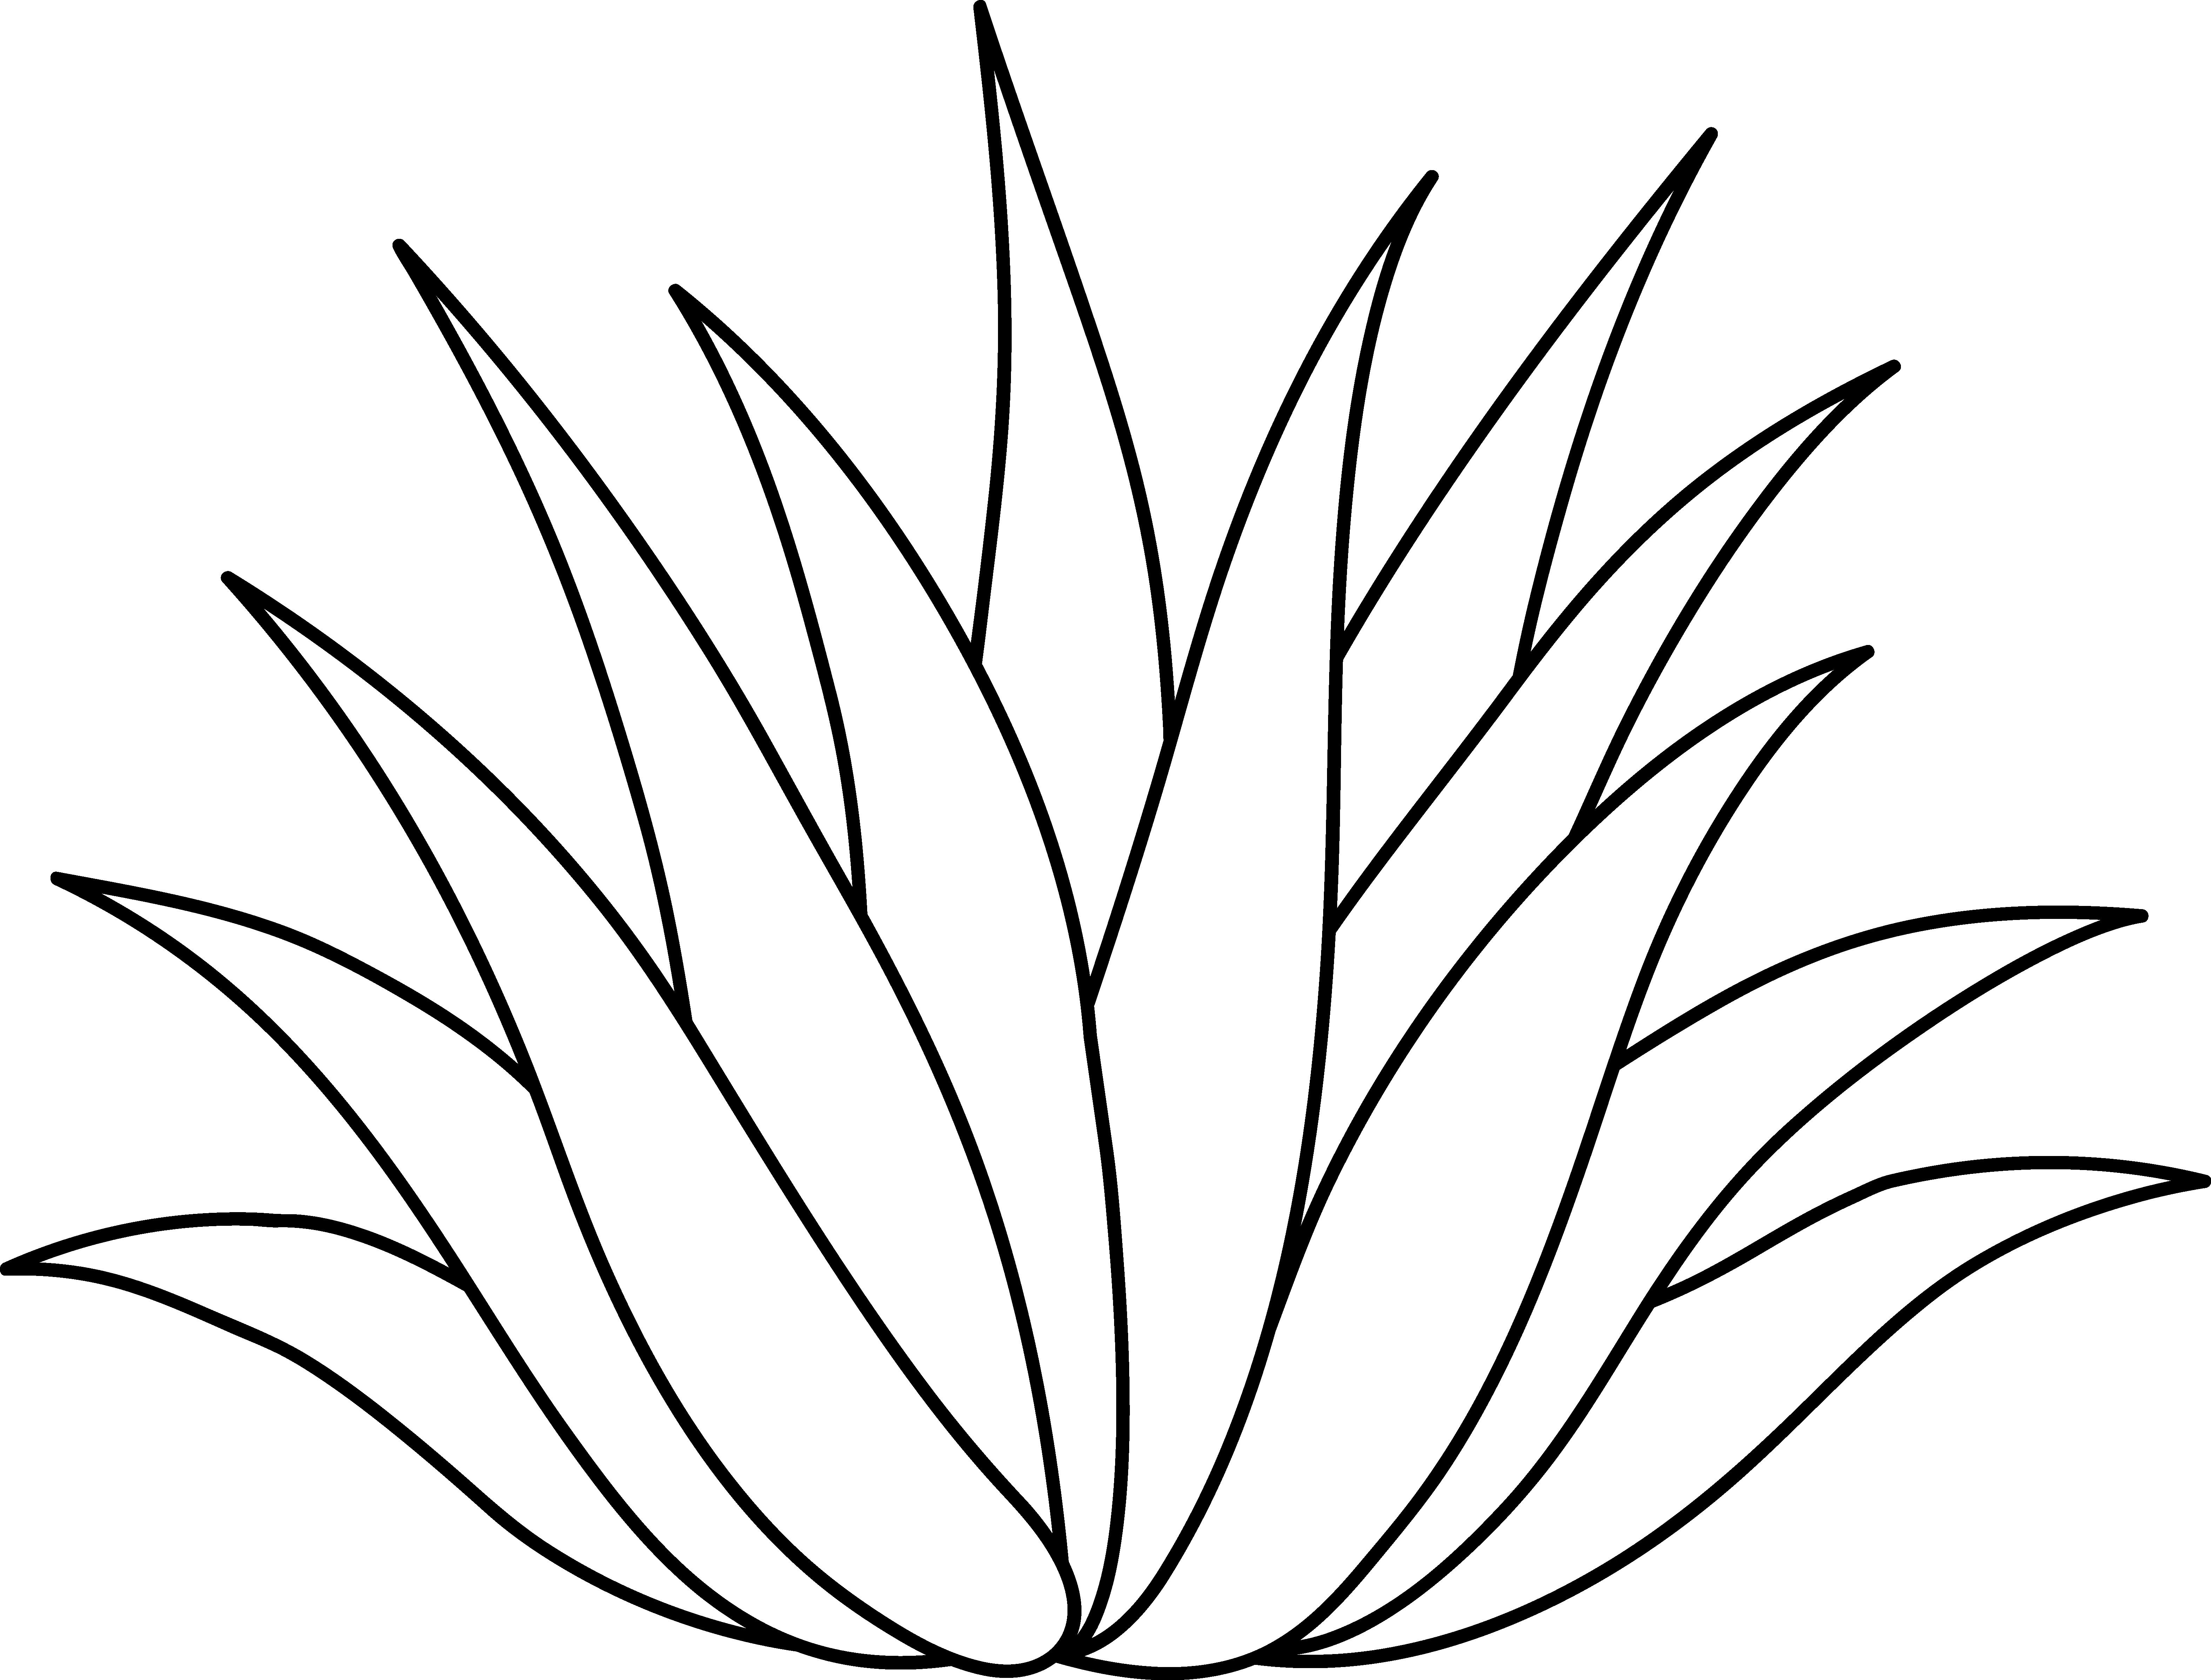 Agave or Aloe Plant Line Art.